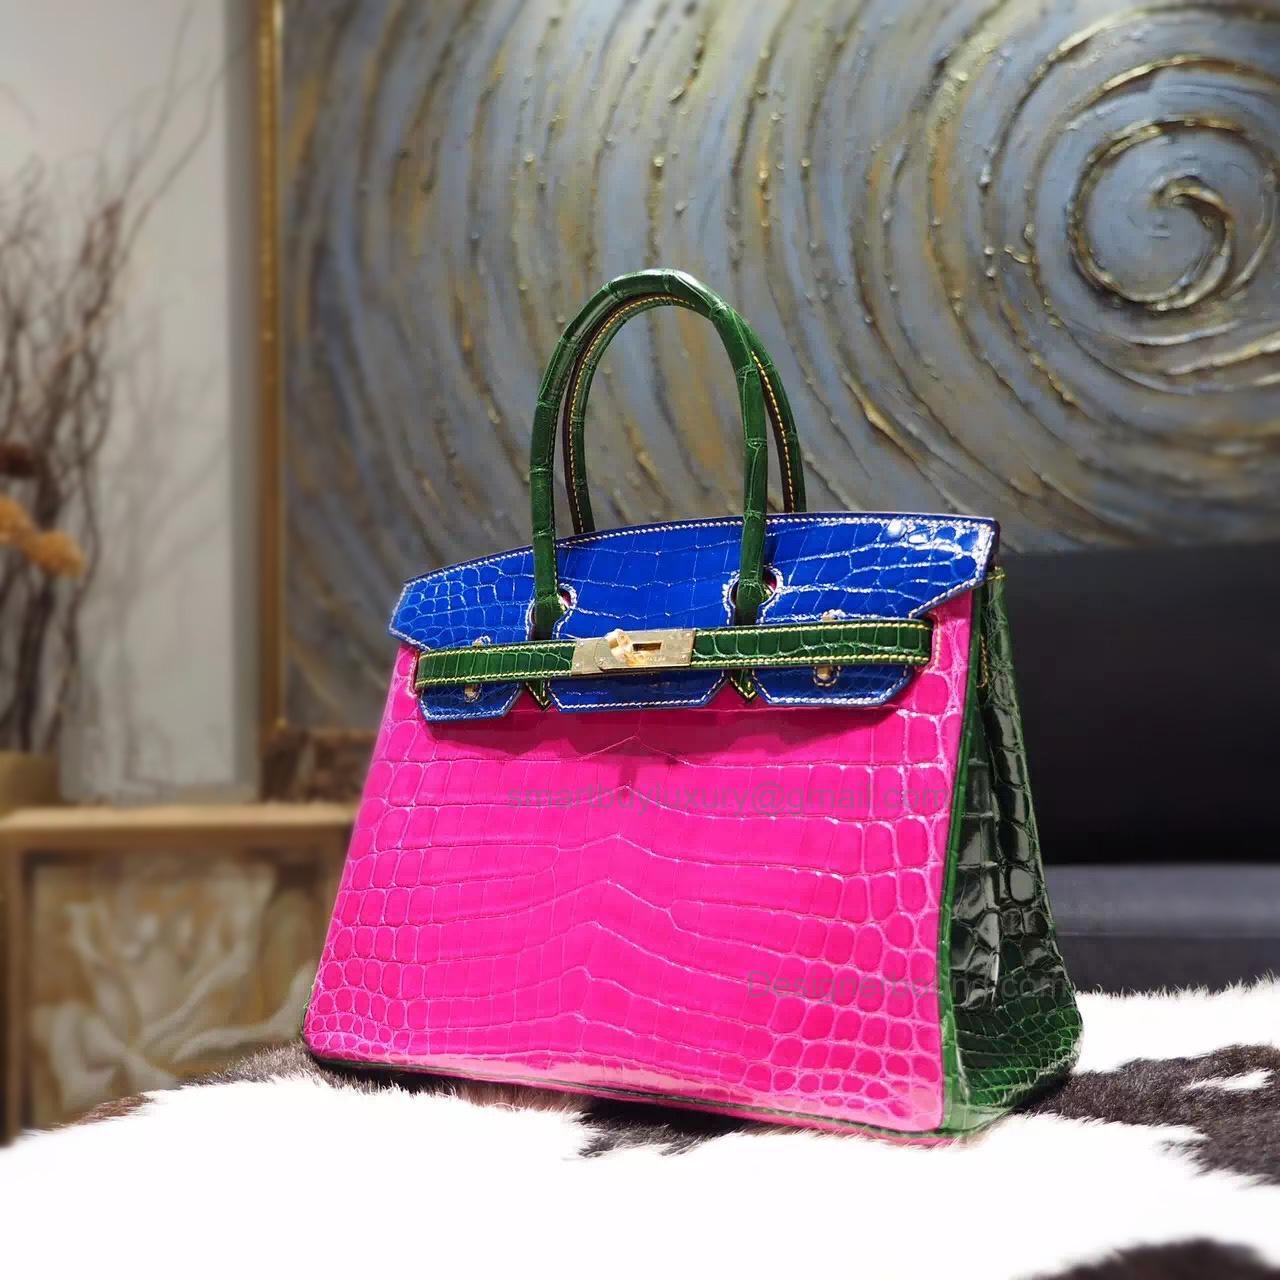 2ba66c522b Hand Stitched Birkin 30 Bag in Multicolored j5 Rose Shining Nile Croc GHW